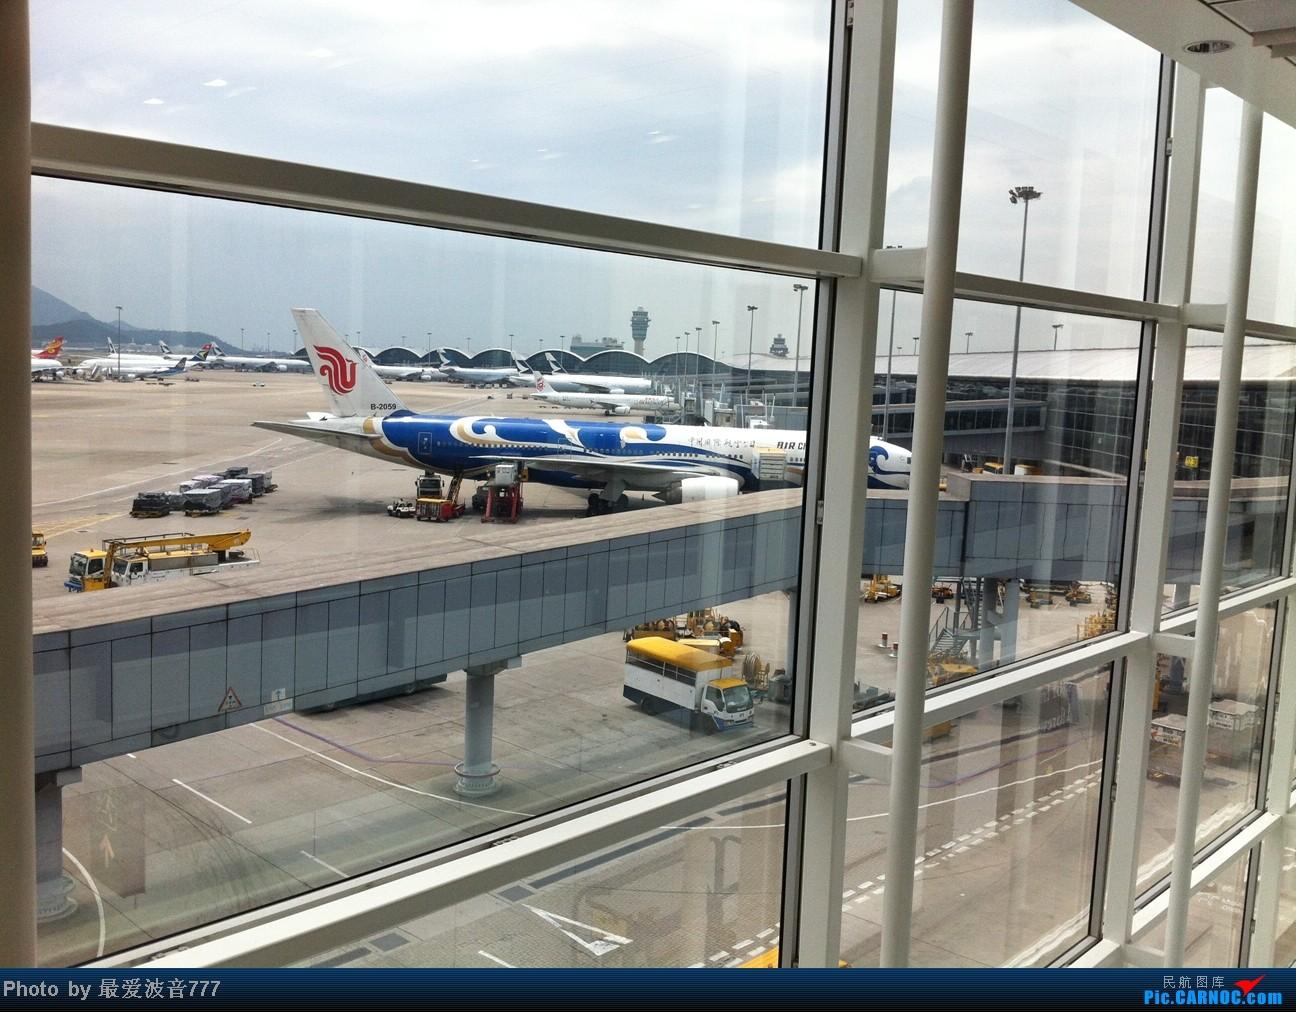 Re:[原创]假期的回国往返之旅 LHR-HKG-CTU-HKG-LHR, CX+CA+KA联合运营 BOEING 777-200 B-2059 中国香港赤鱲角国际机场